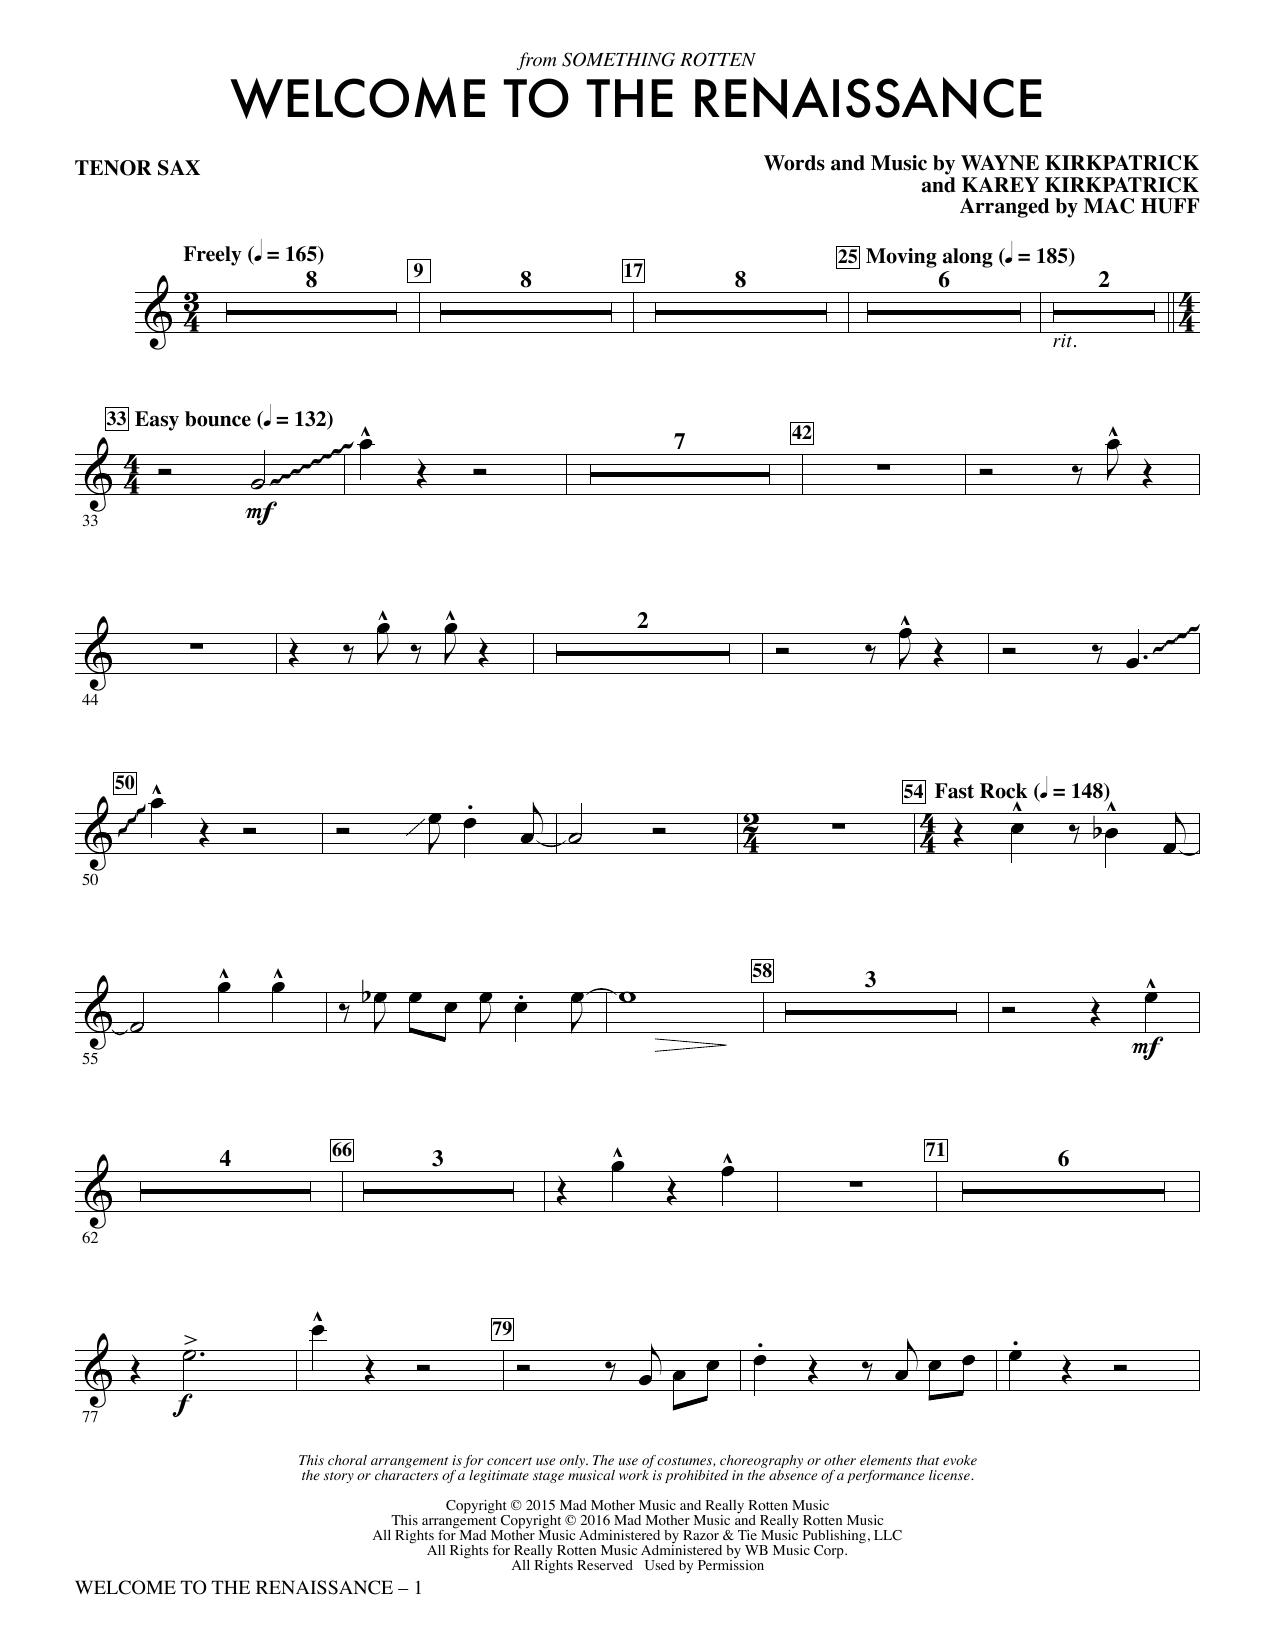 Welcome to the Renaissance - Tenor Sax Sheet Music